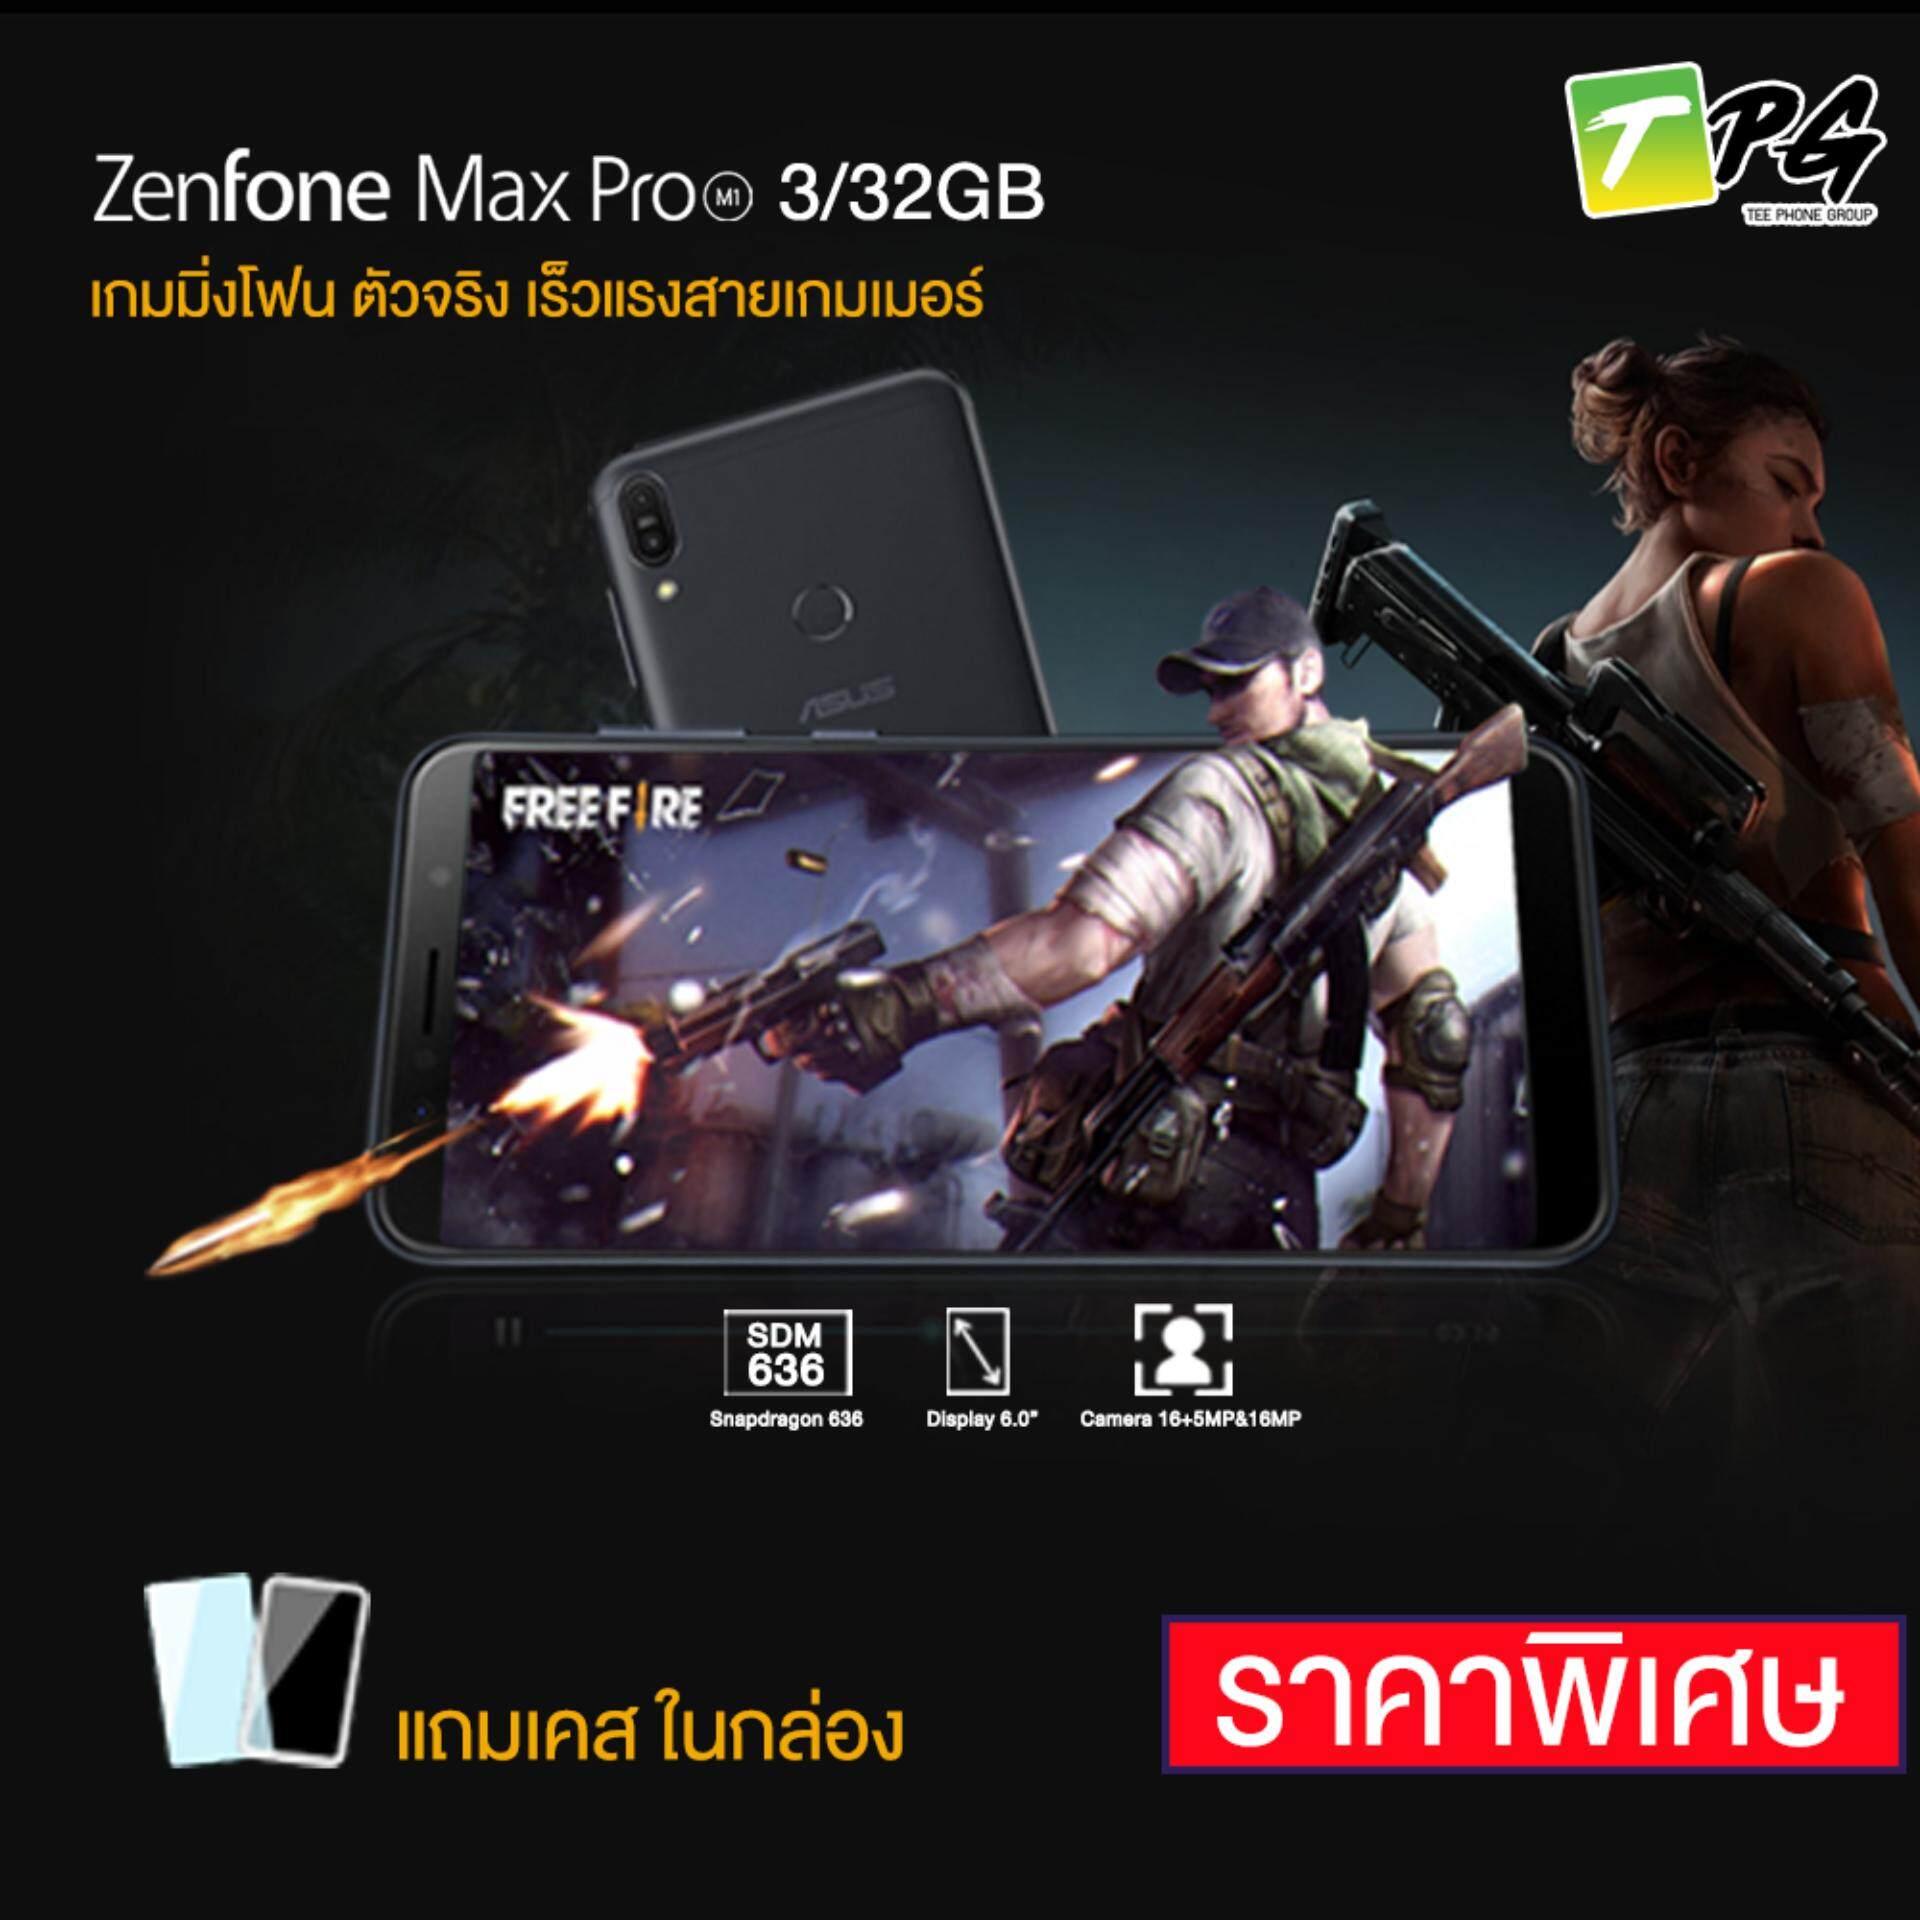 ASUS Zenfone Max Pro M1 2018 (ZB602KL) 3/32GB  แถมเคสในกล่อง [แคมเปญพิเศษ]